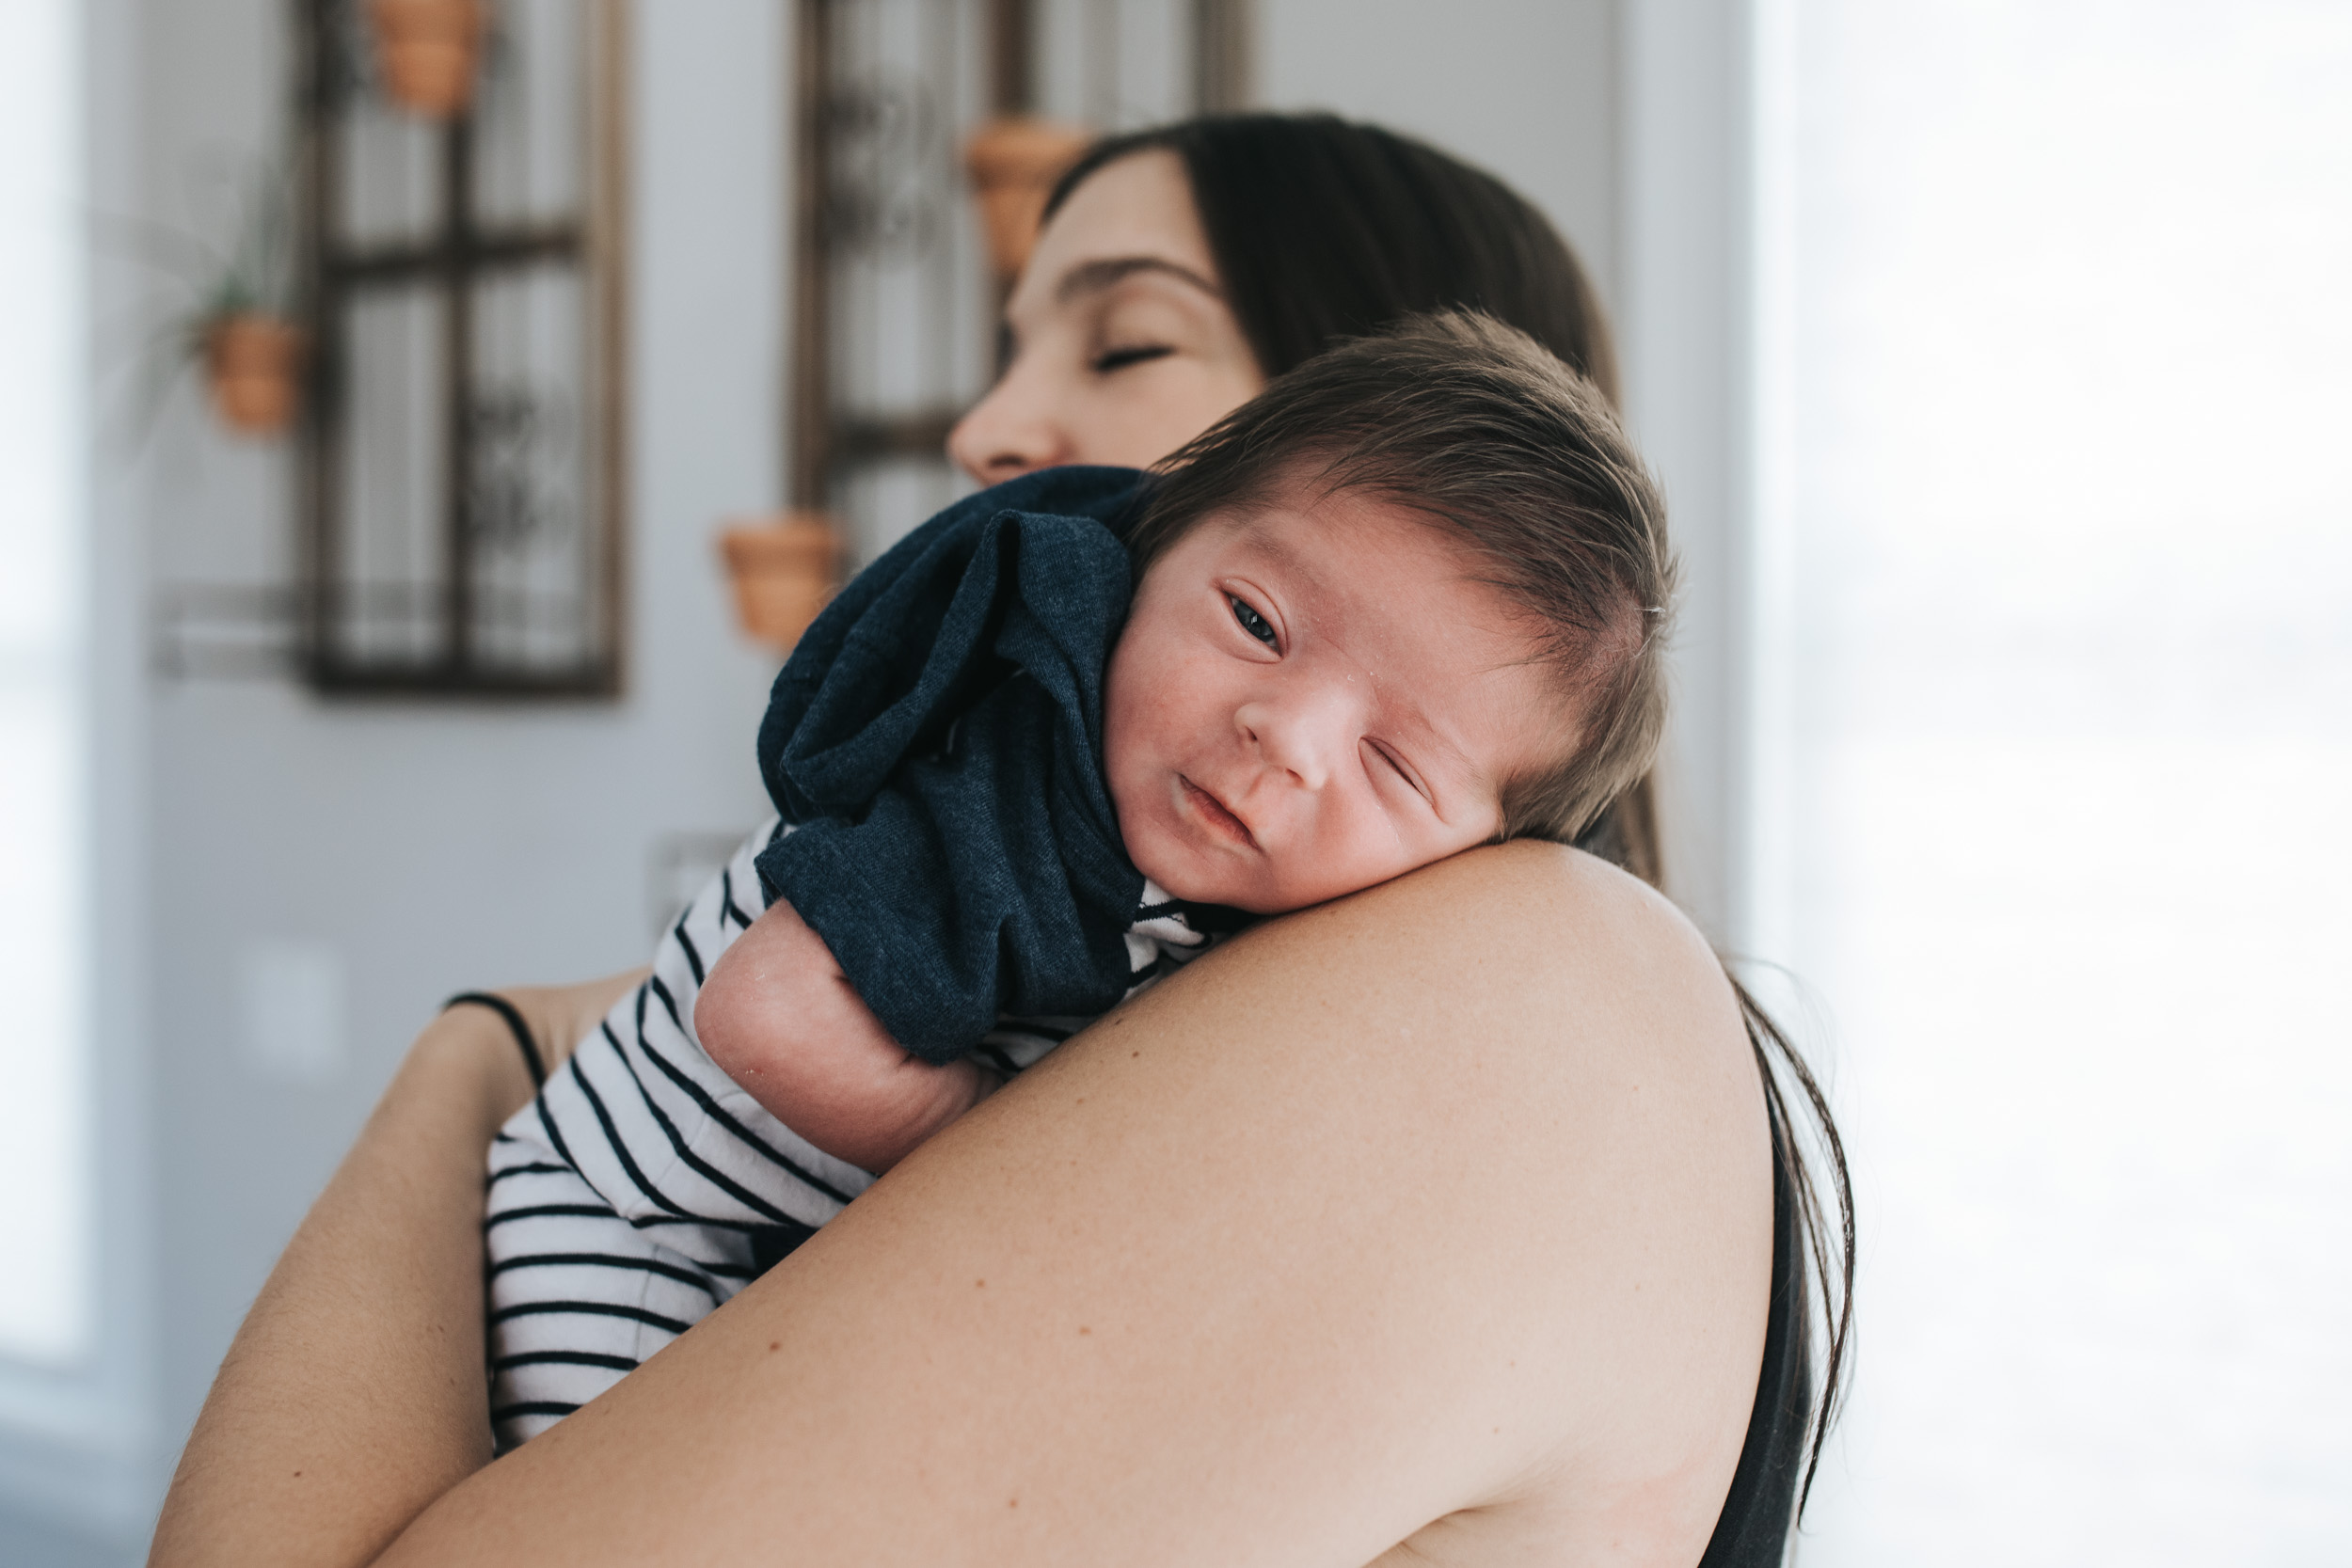 StephenPaynePhotography_BabyTaylor-15.jpg